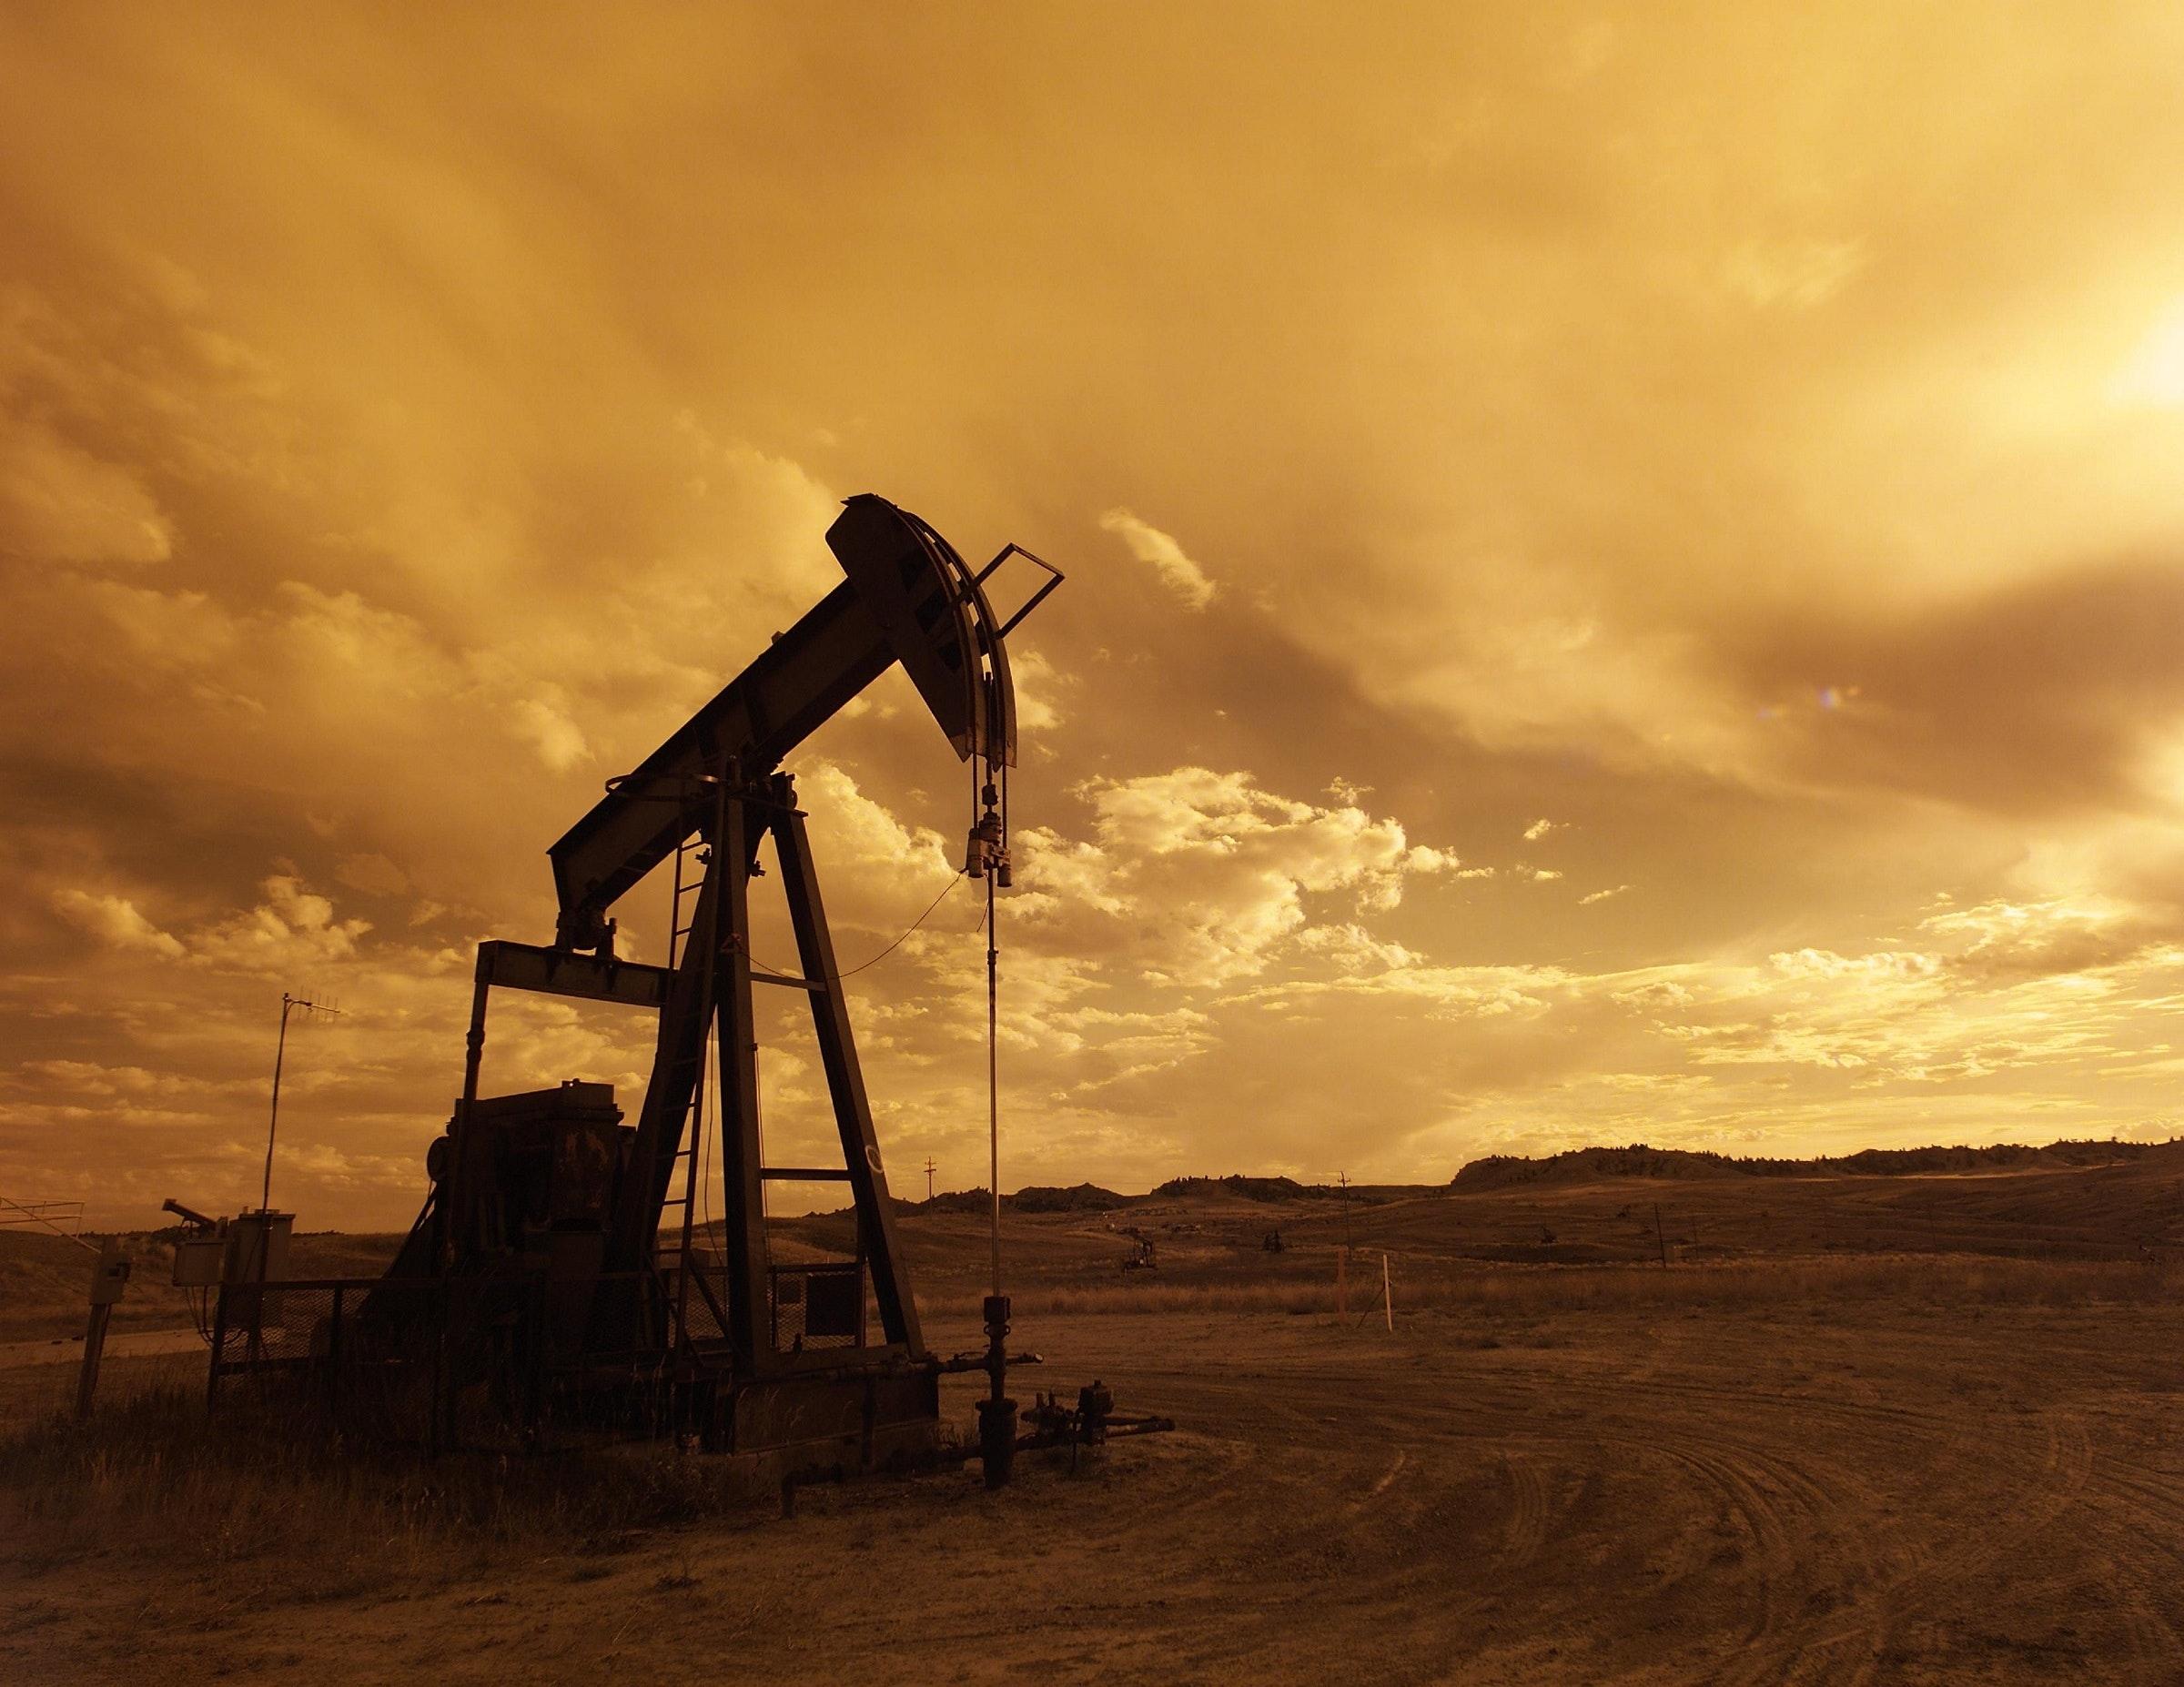 Please fund New Mexico's regulatory agencies